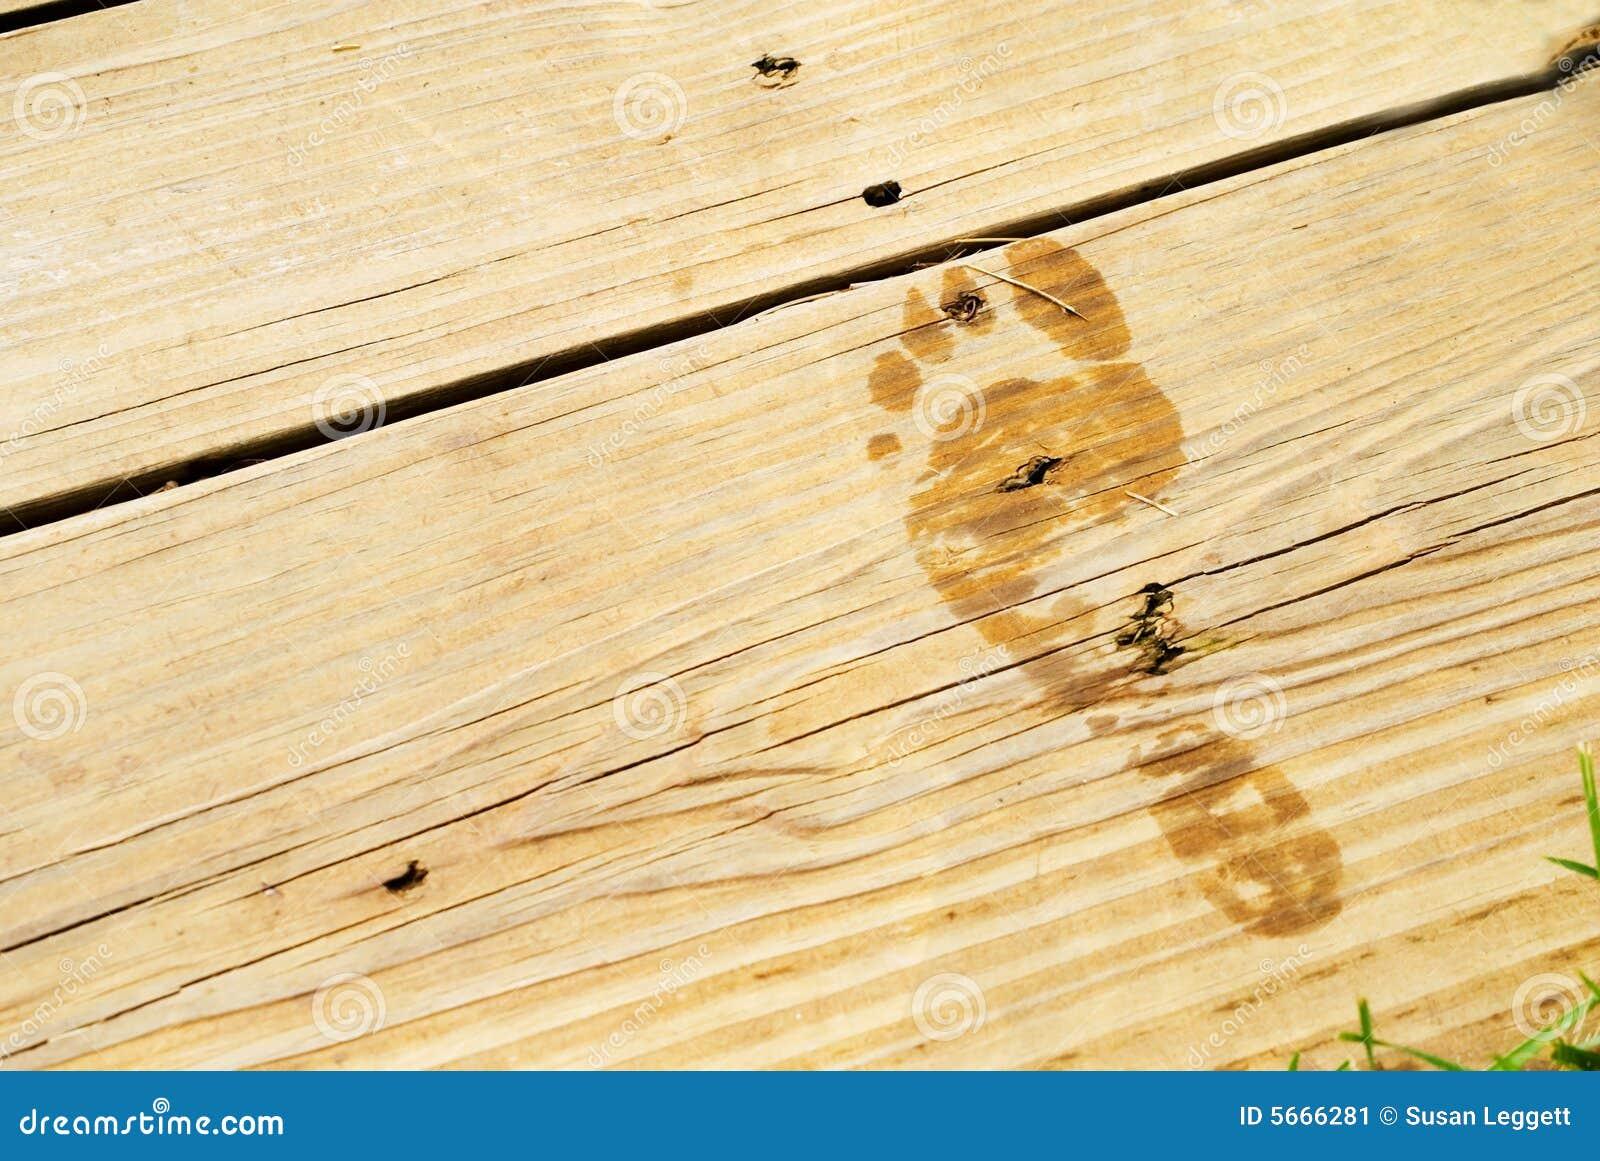 Wet Footprint on Wood Deck